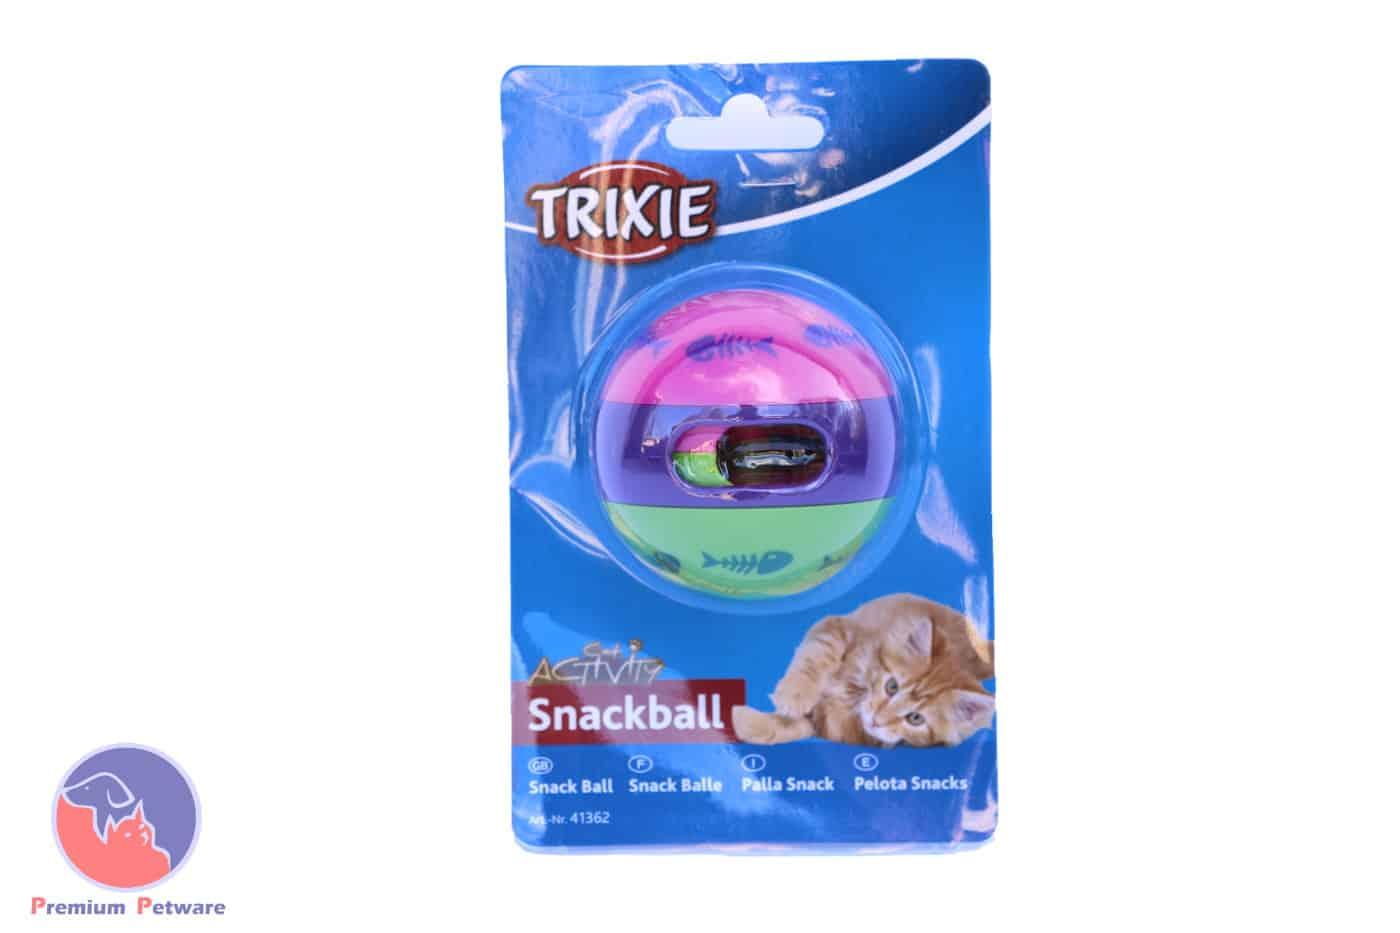 Trixie Activity Snack Ball Treat Dispenser Premium Petware